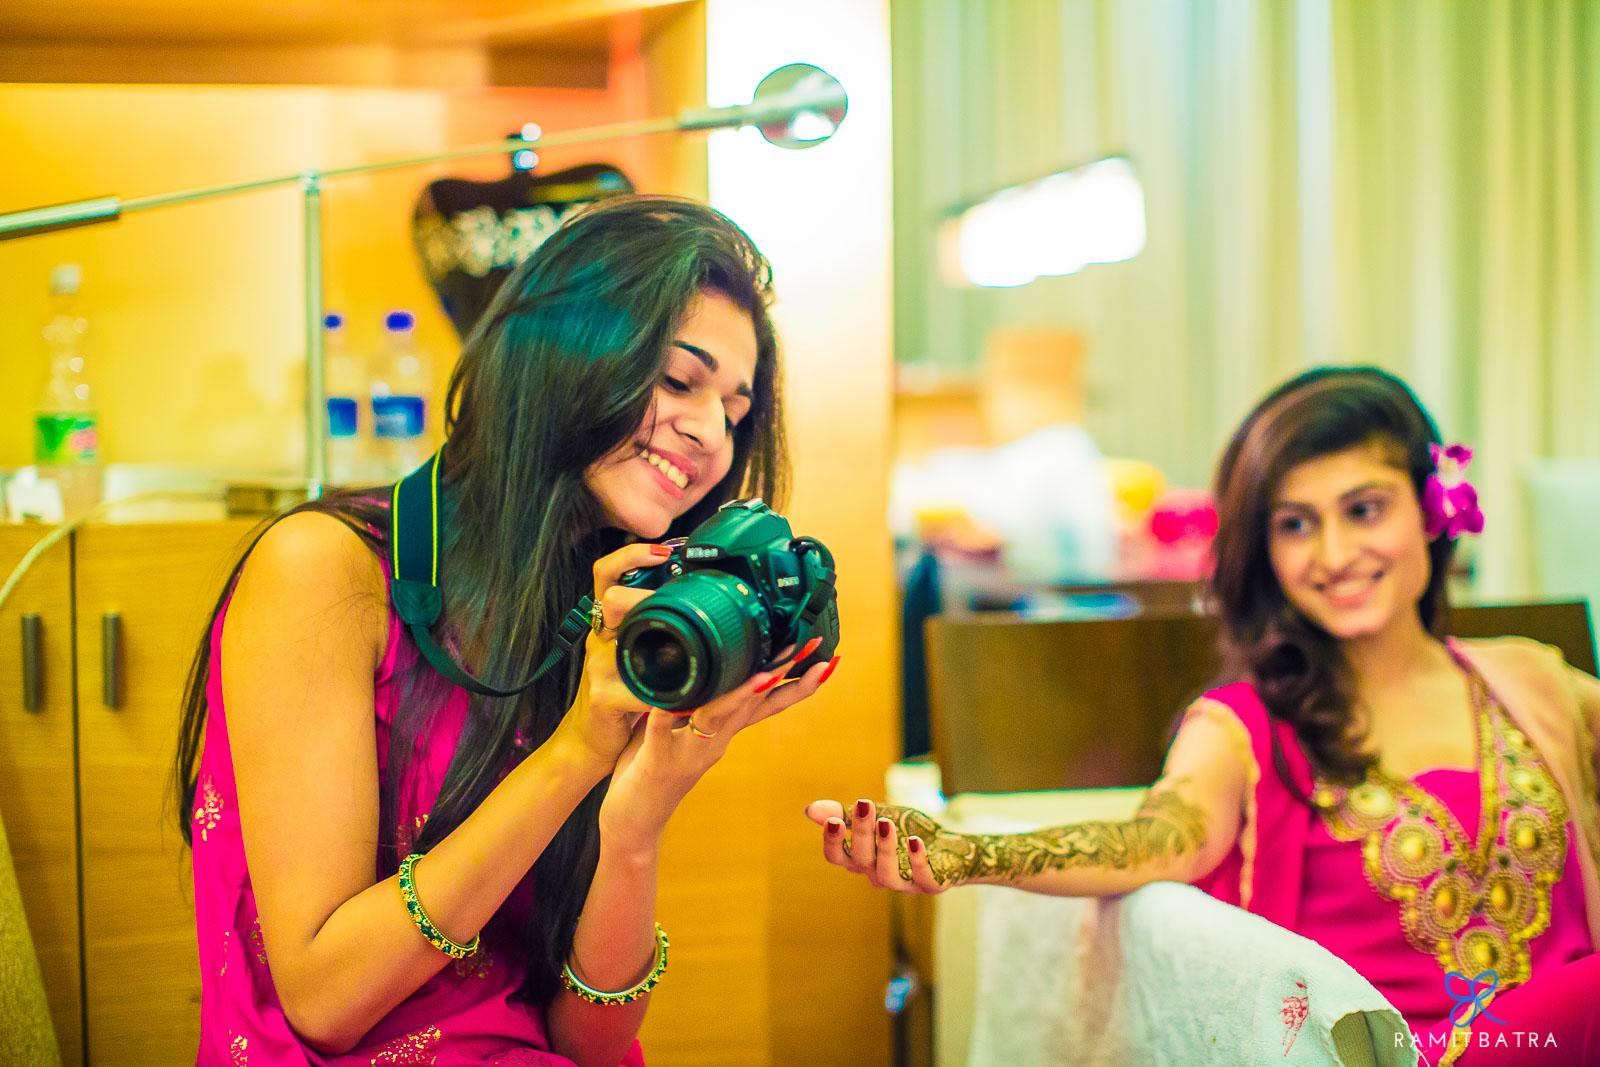 Wedding Photographer Hyderabad India Ramitbatra 03 Ramit Batra Best Candid Award Winning Photography Top 10 In